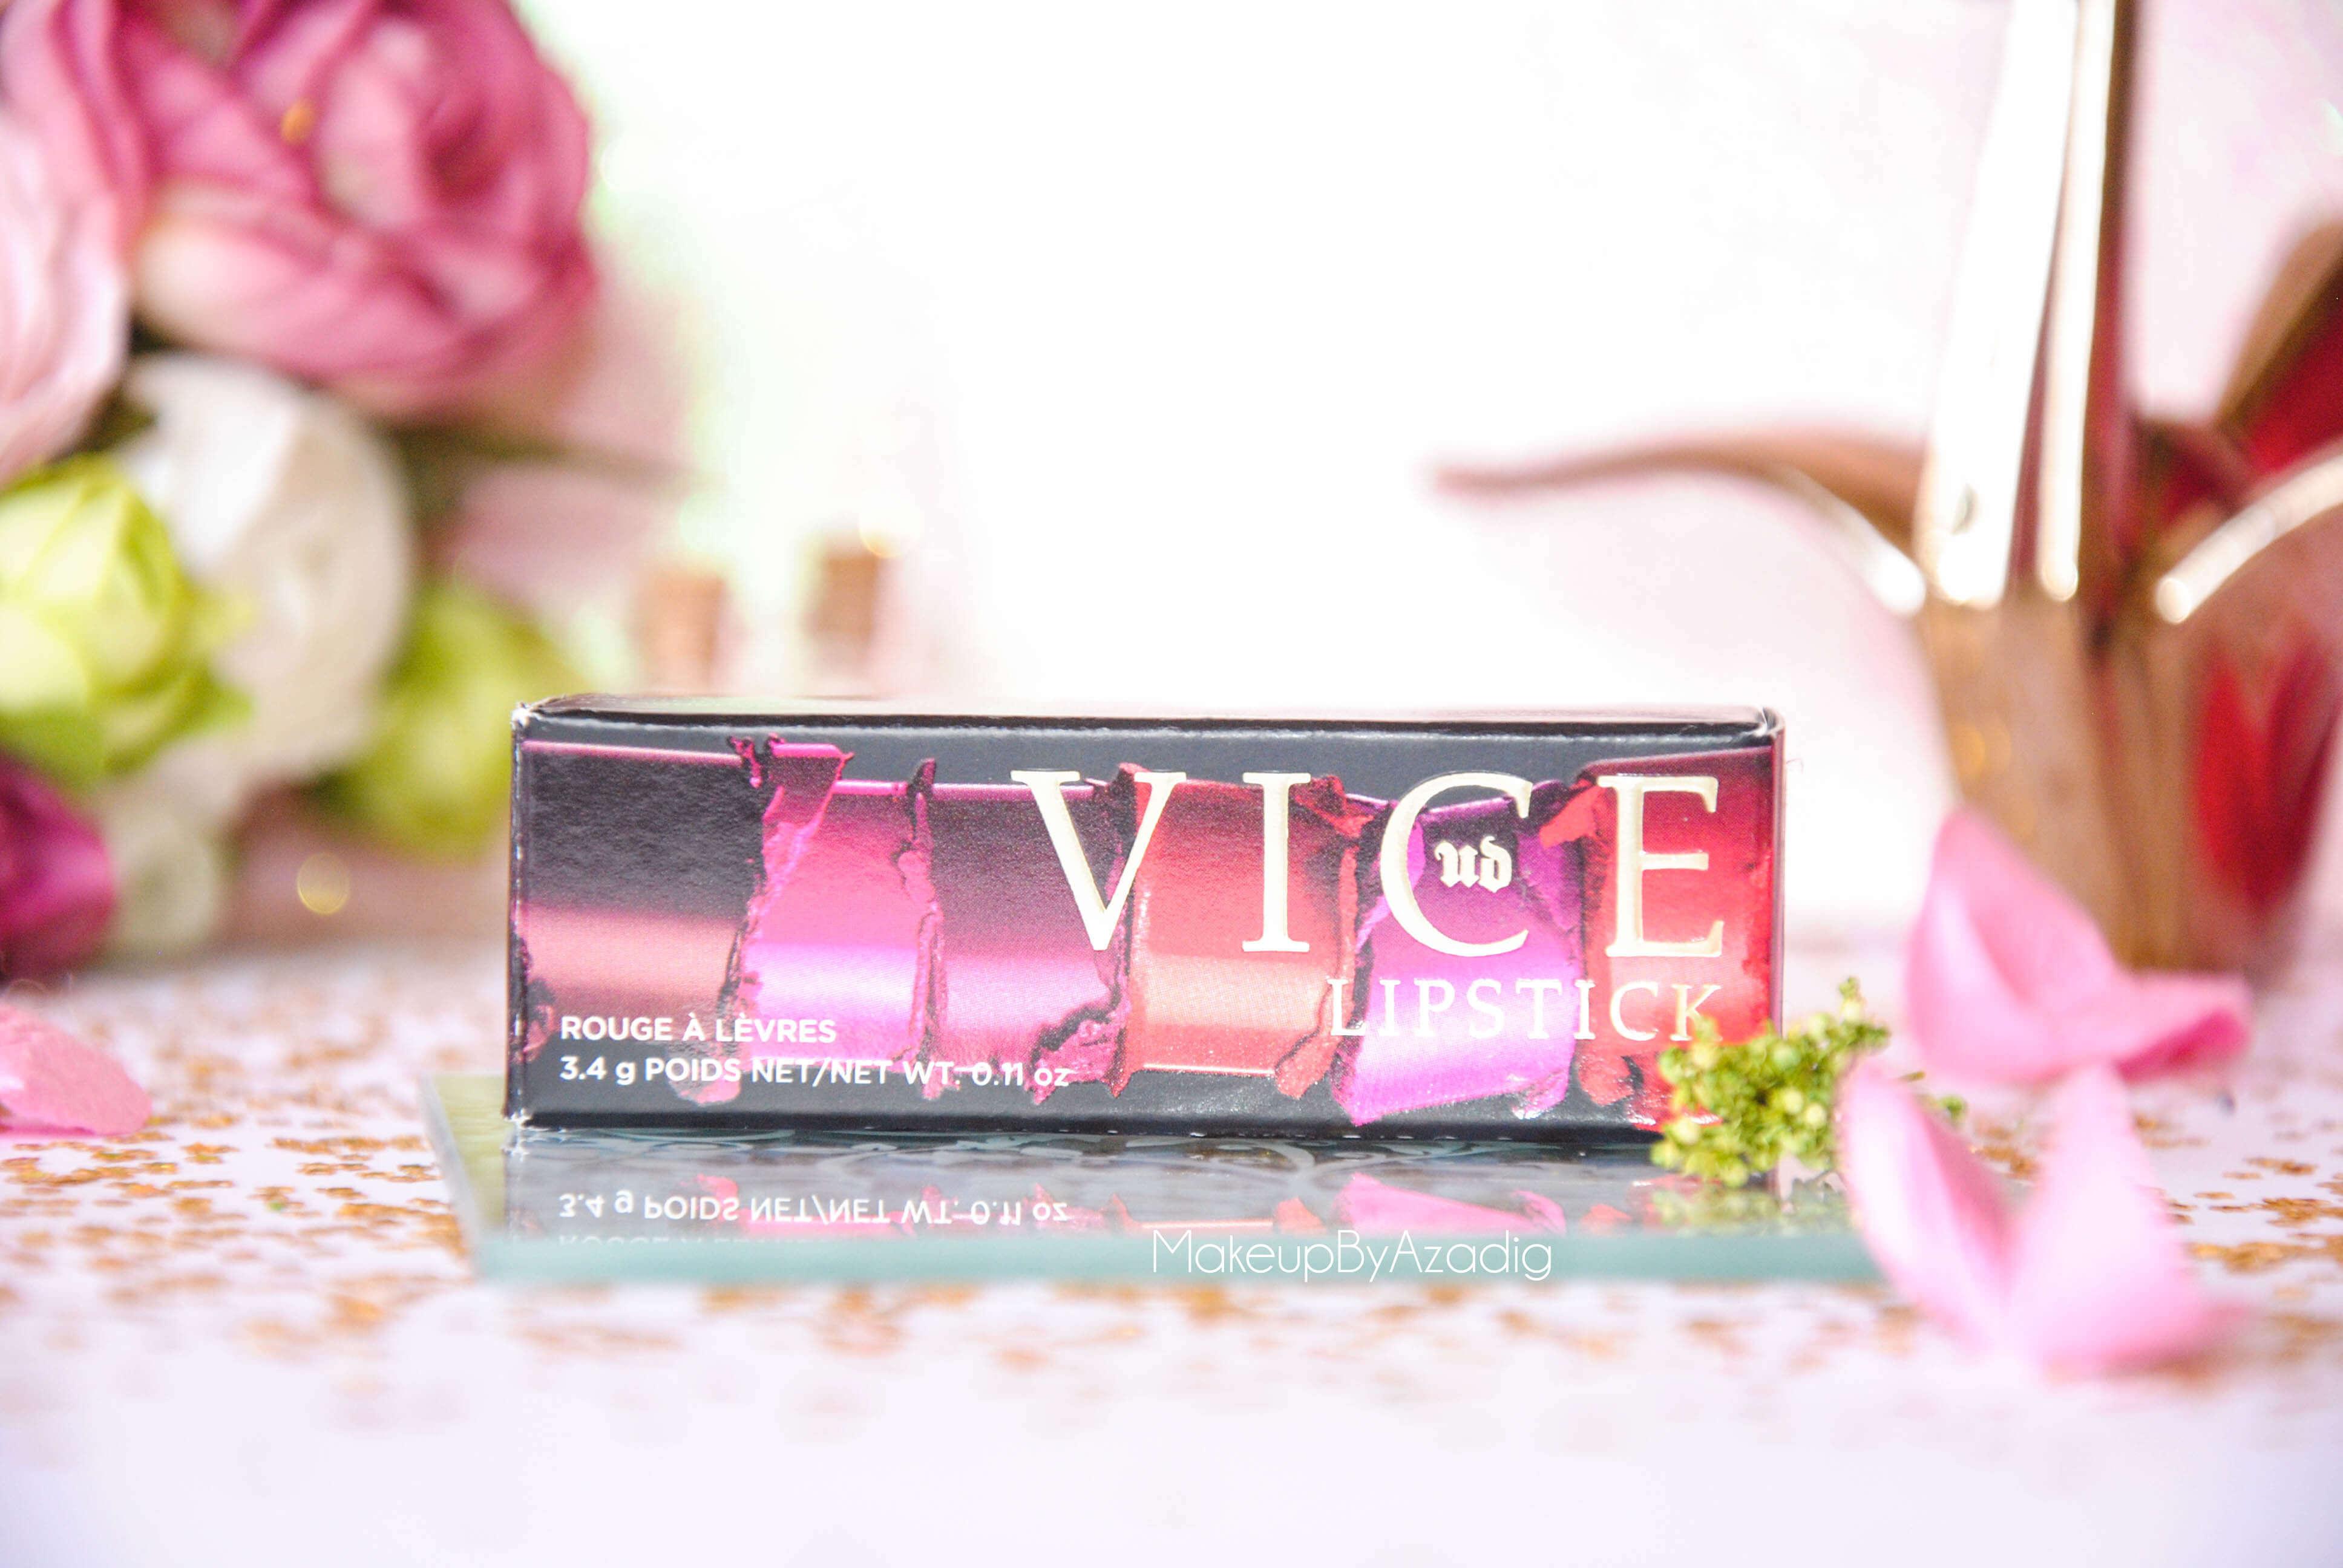 vice lipstick-urban decay-makeupbyazadig-backtalk-mauve-rouge a levres-avis-revue-swatch-review-boite